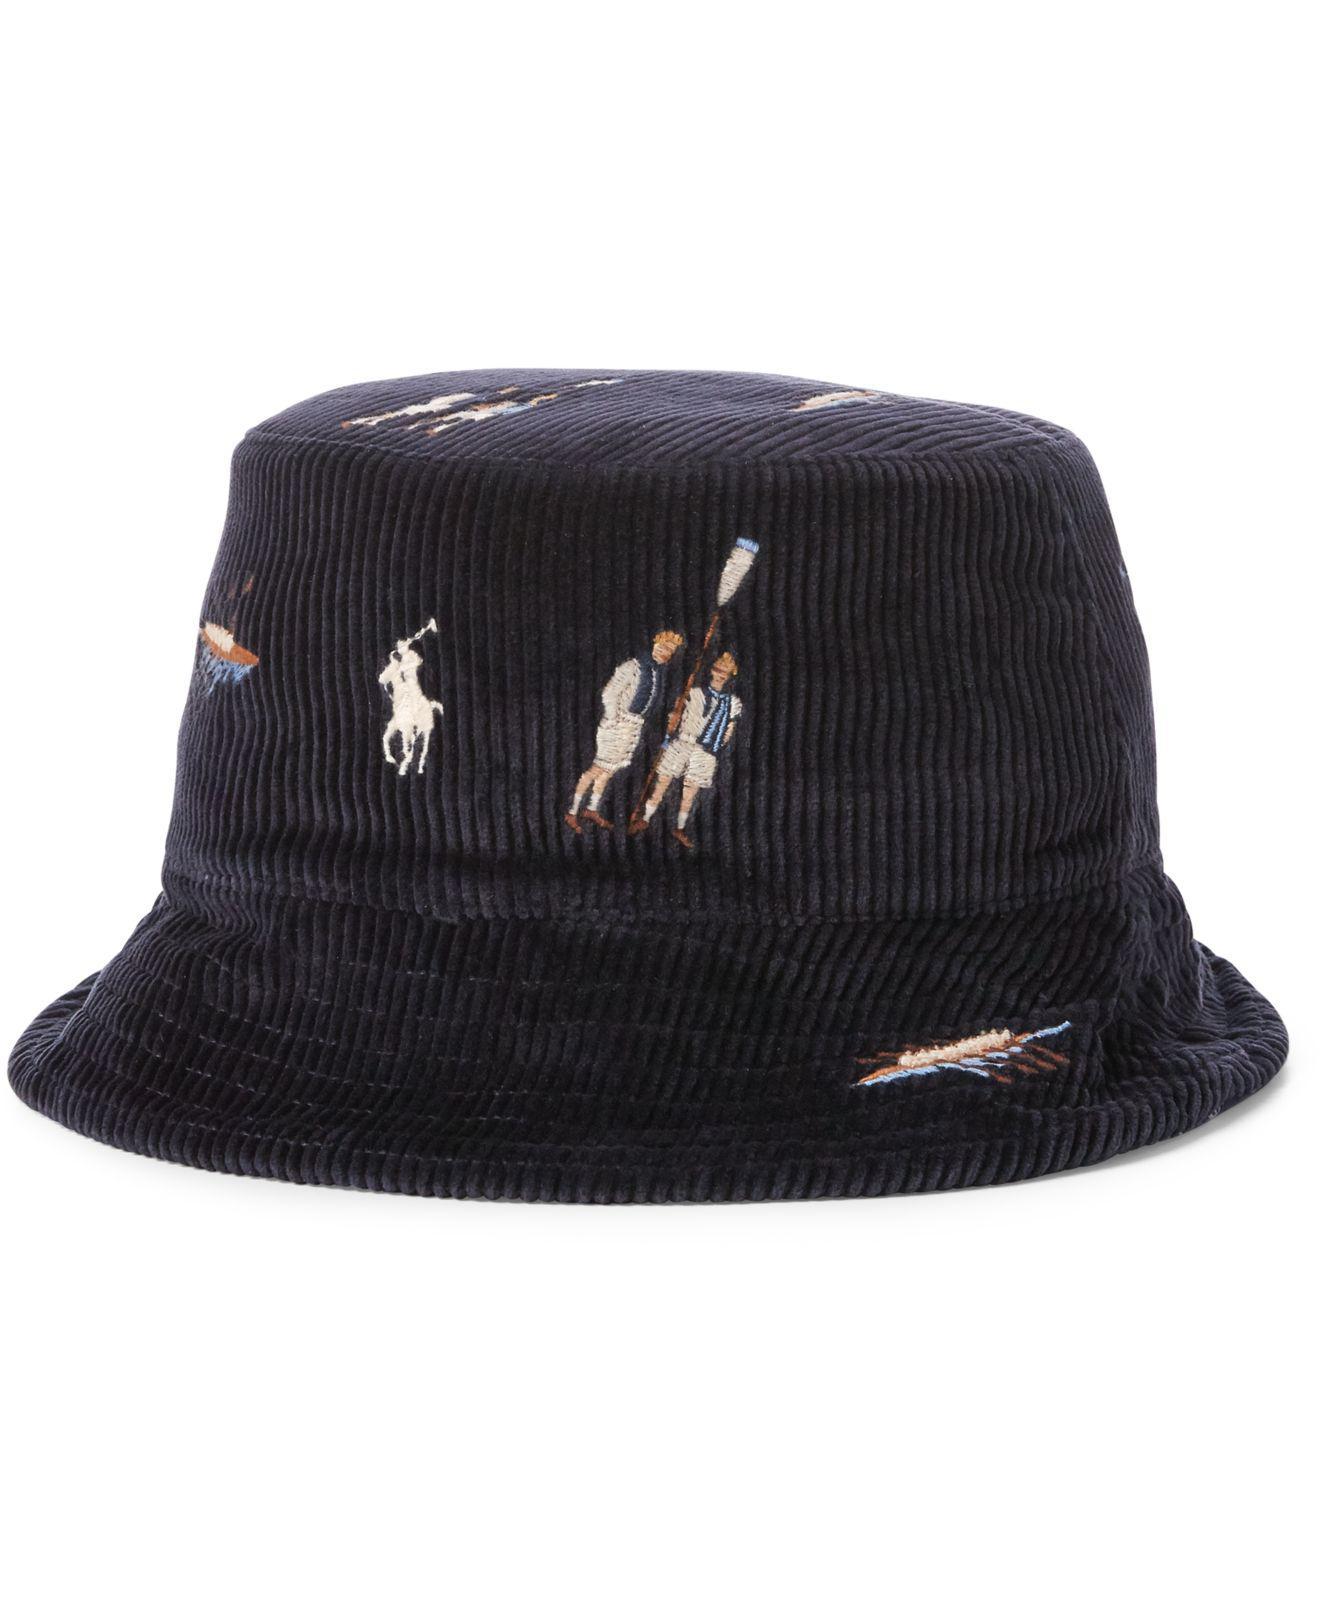 ae8794b20de Lyst - Polo Ralph Lauren Reversible Chino Bucket Hat in Blue for Men